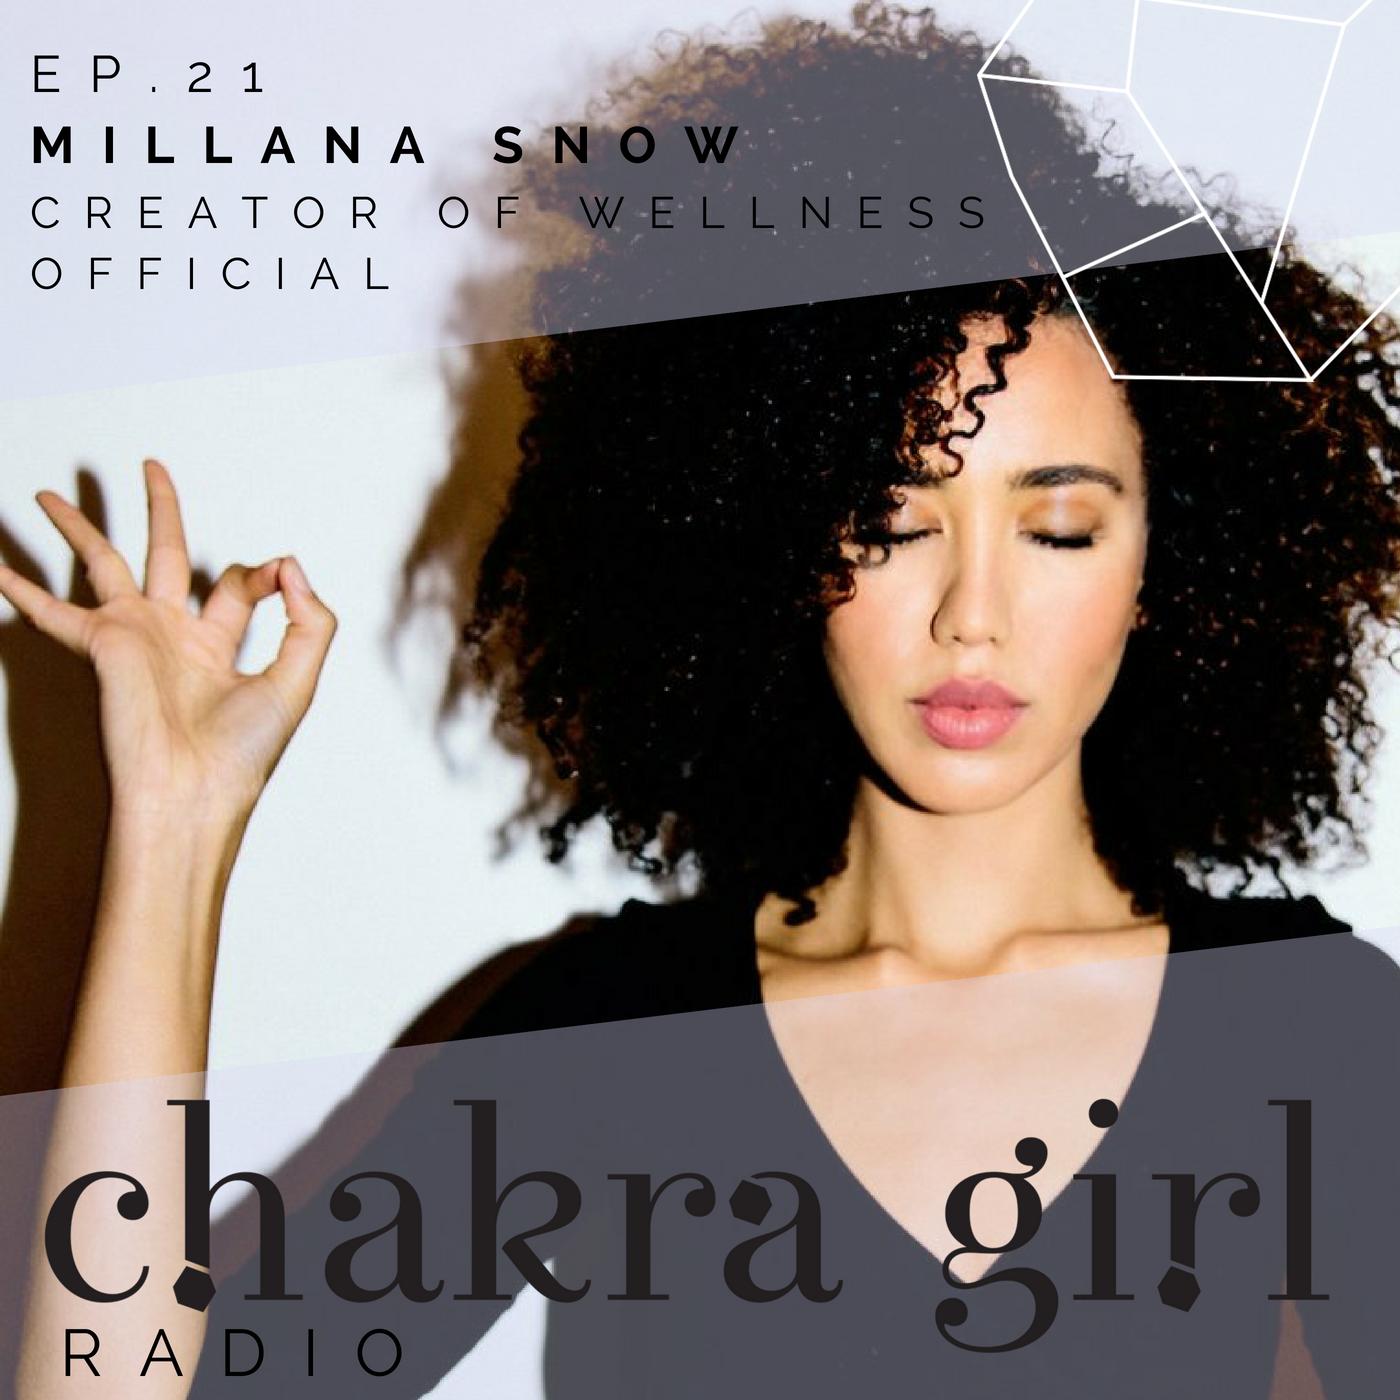 MILLANA SNOW CHAKRA GIRL RADIO.png